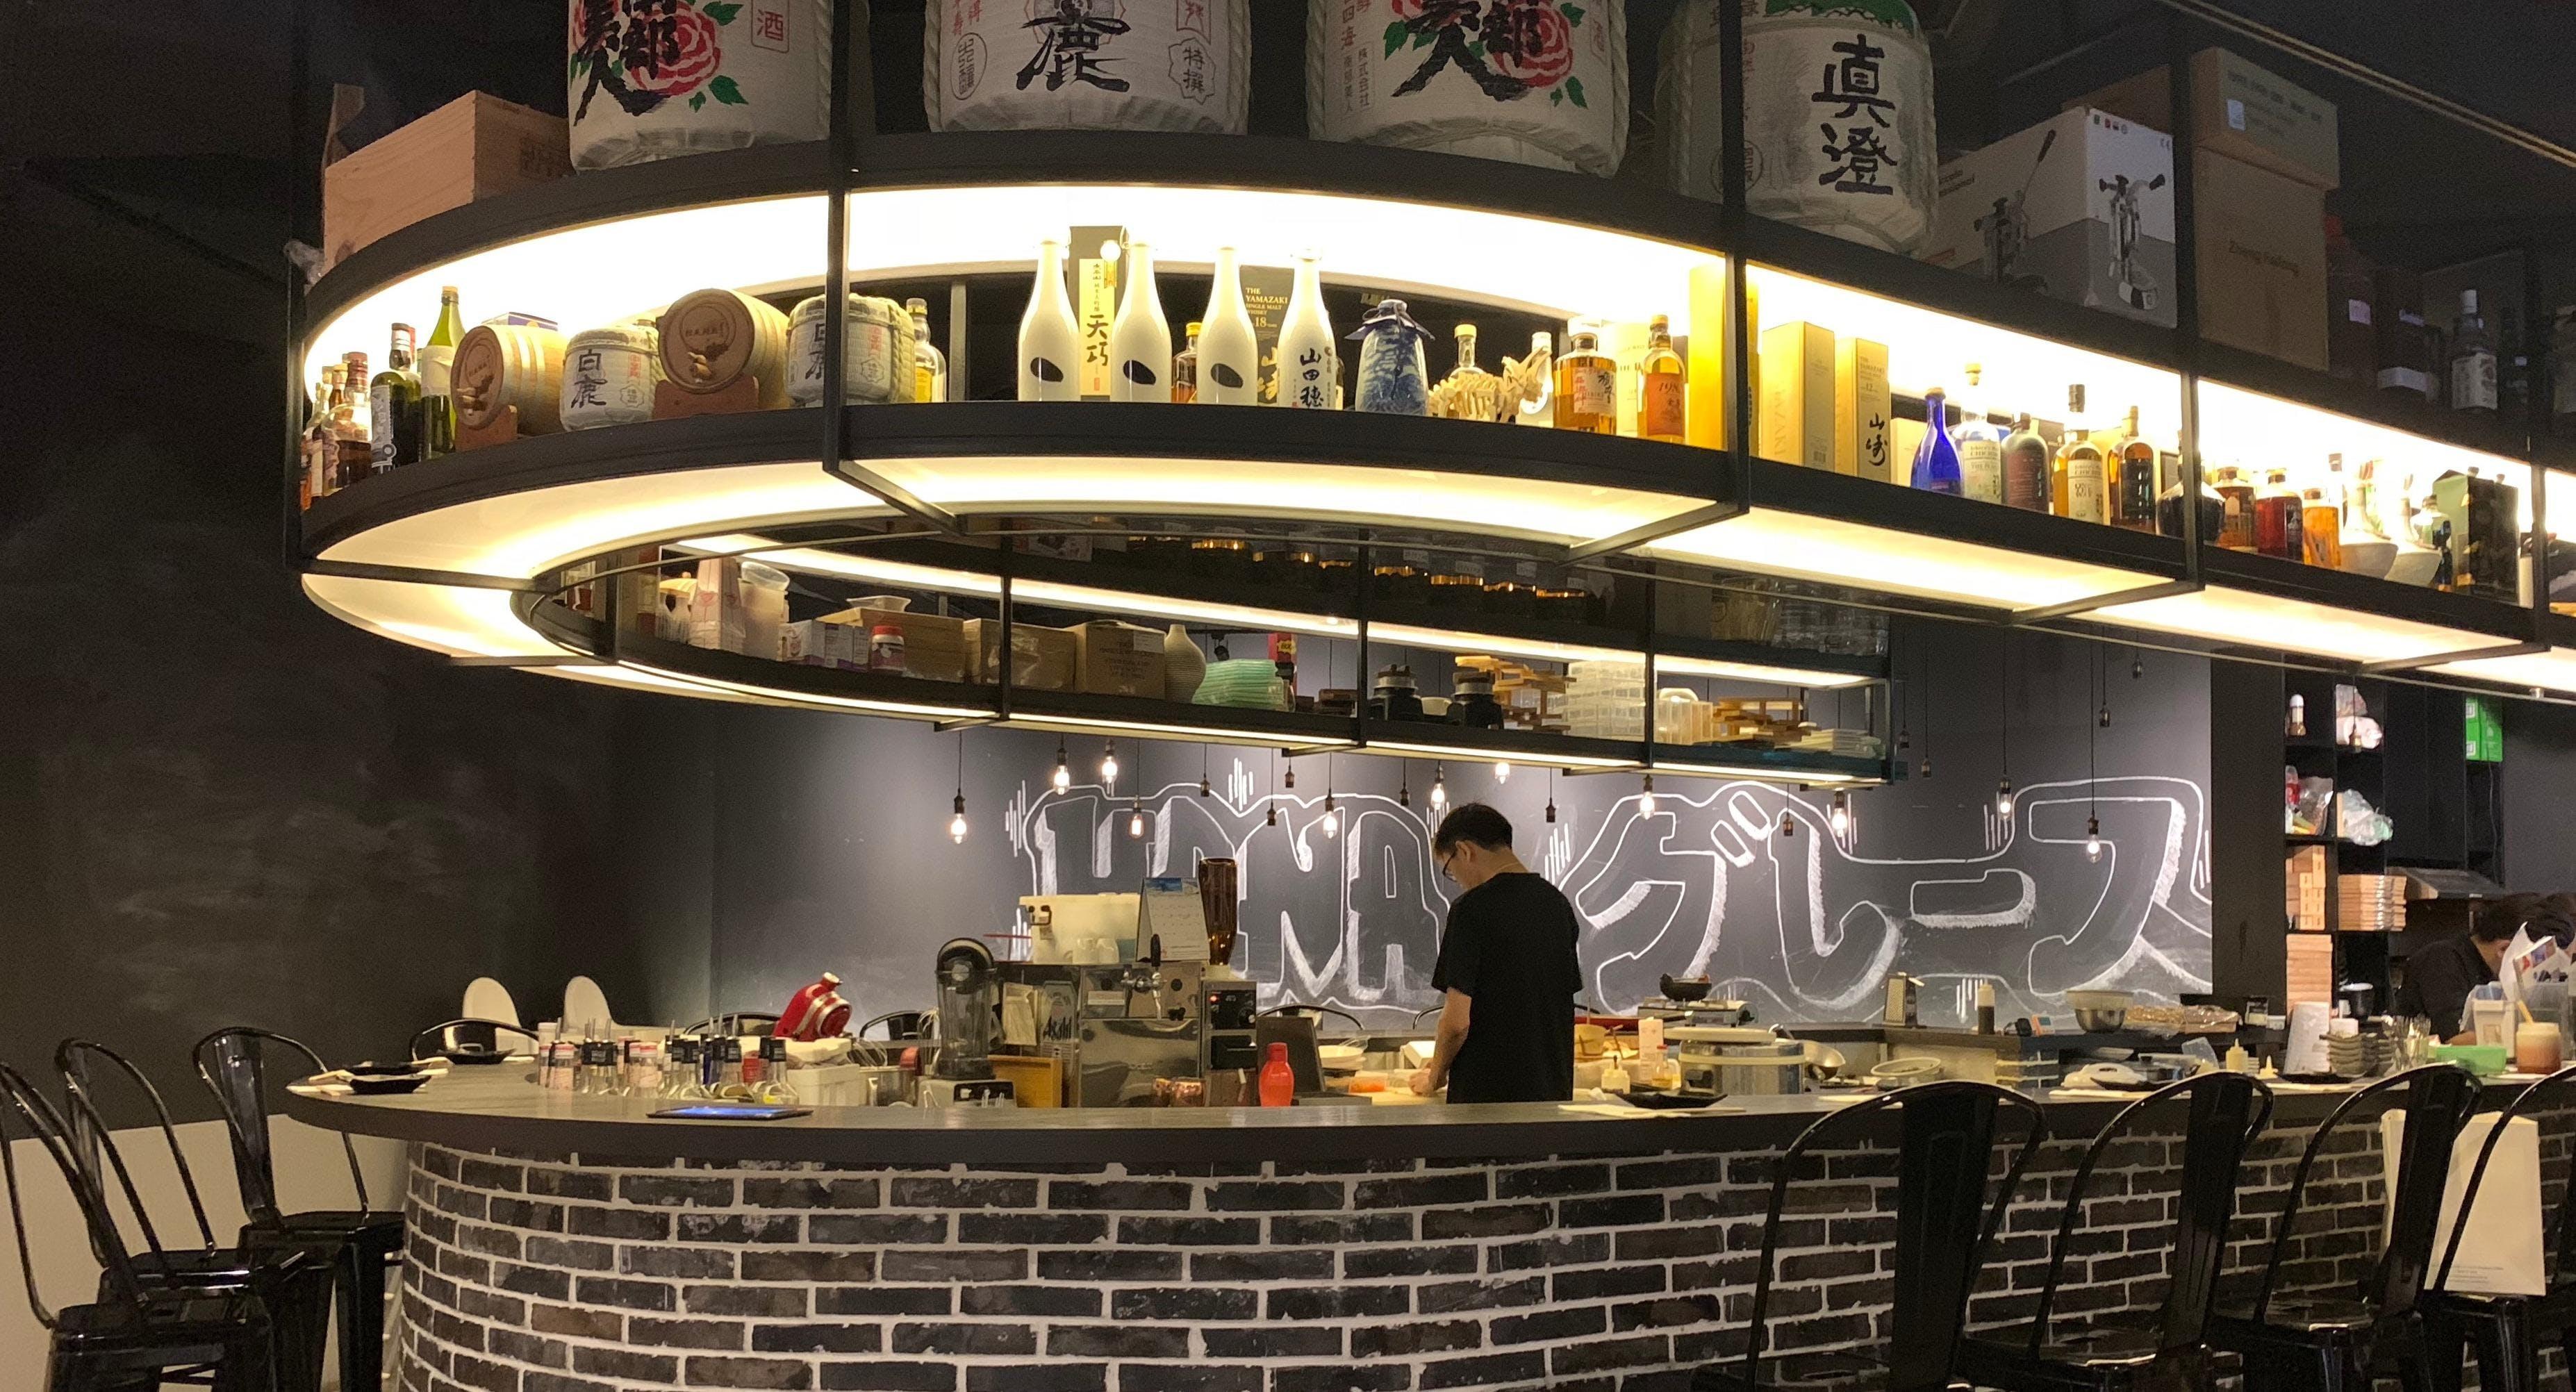 Hana Restaurant Singapore image 3